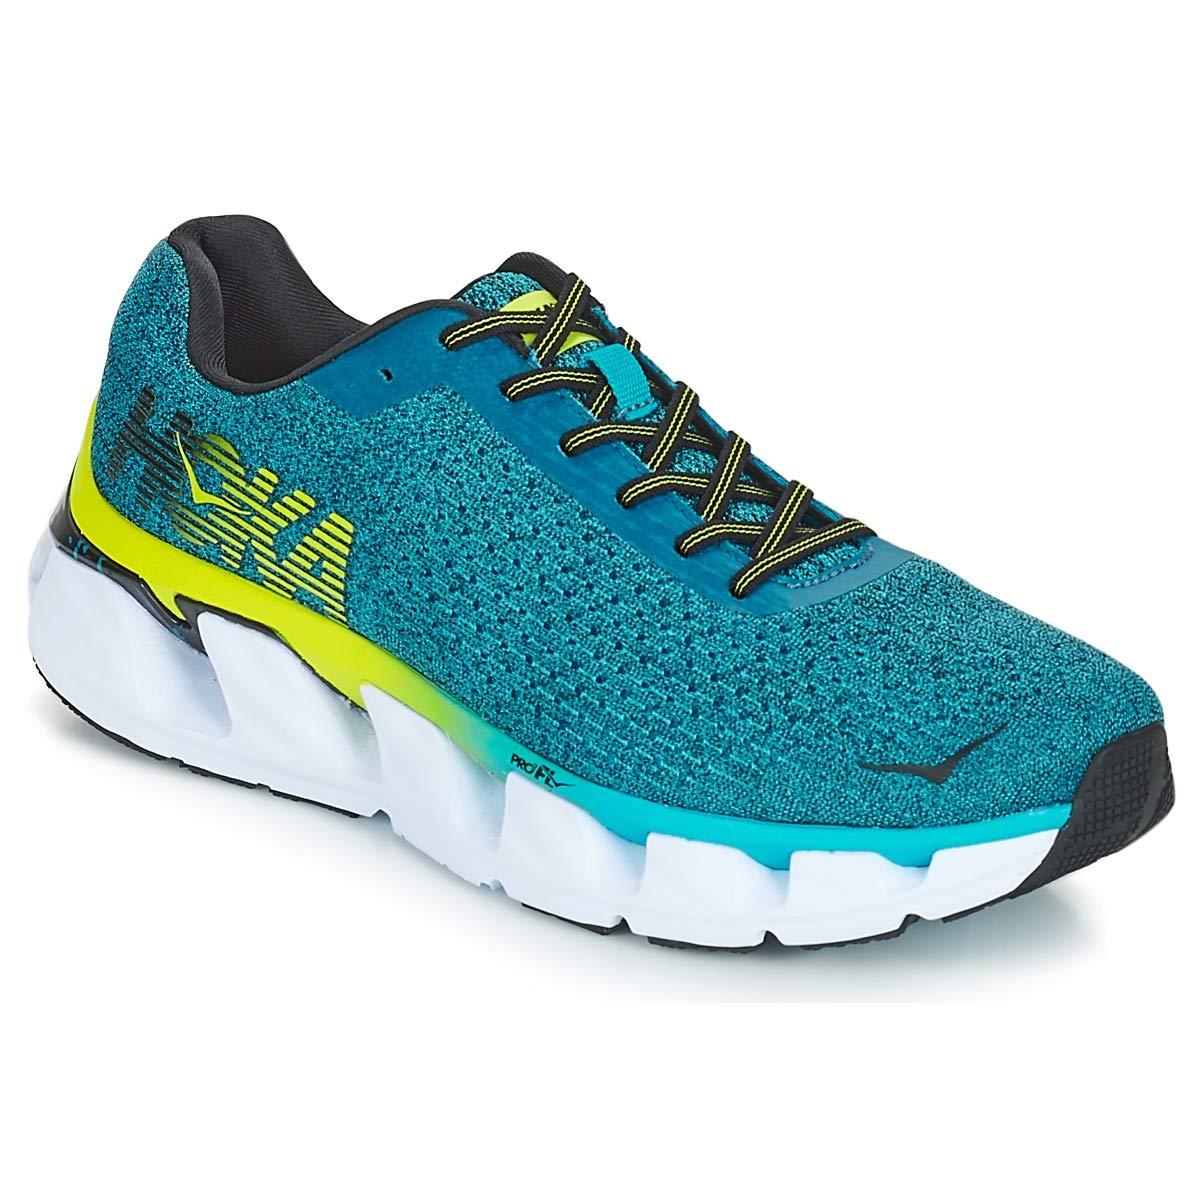 Hoka One One Elevon Running Schuhes Men Caribbean sea schwarz  Schuhgröße US 11,5  schwarz  EU 46 2 3 2018 Laufsport Schuhe 0334fd